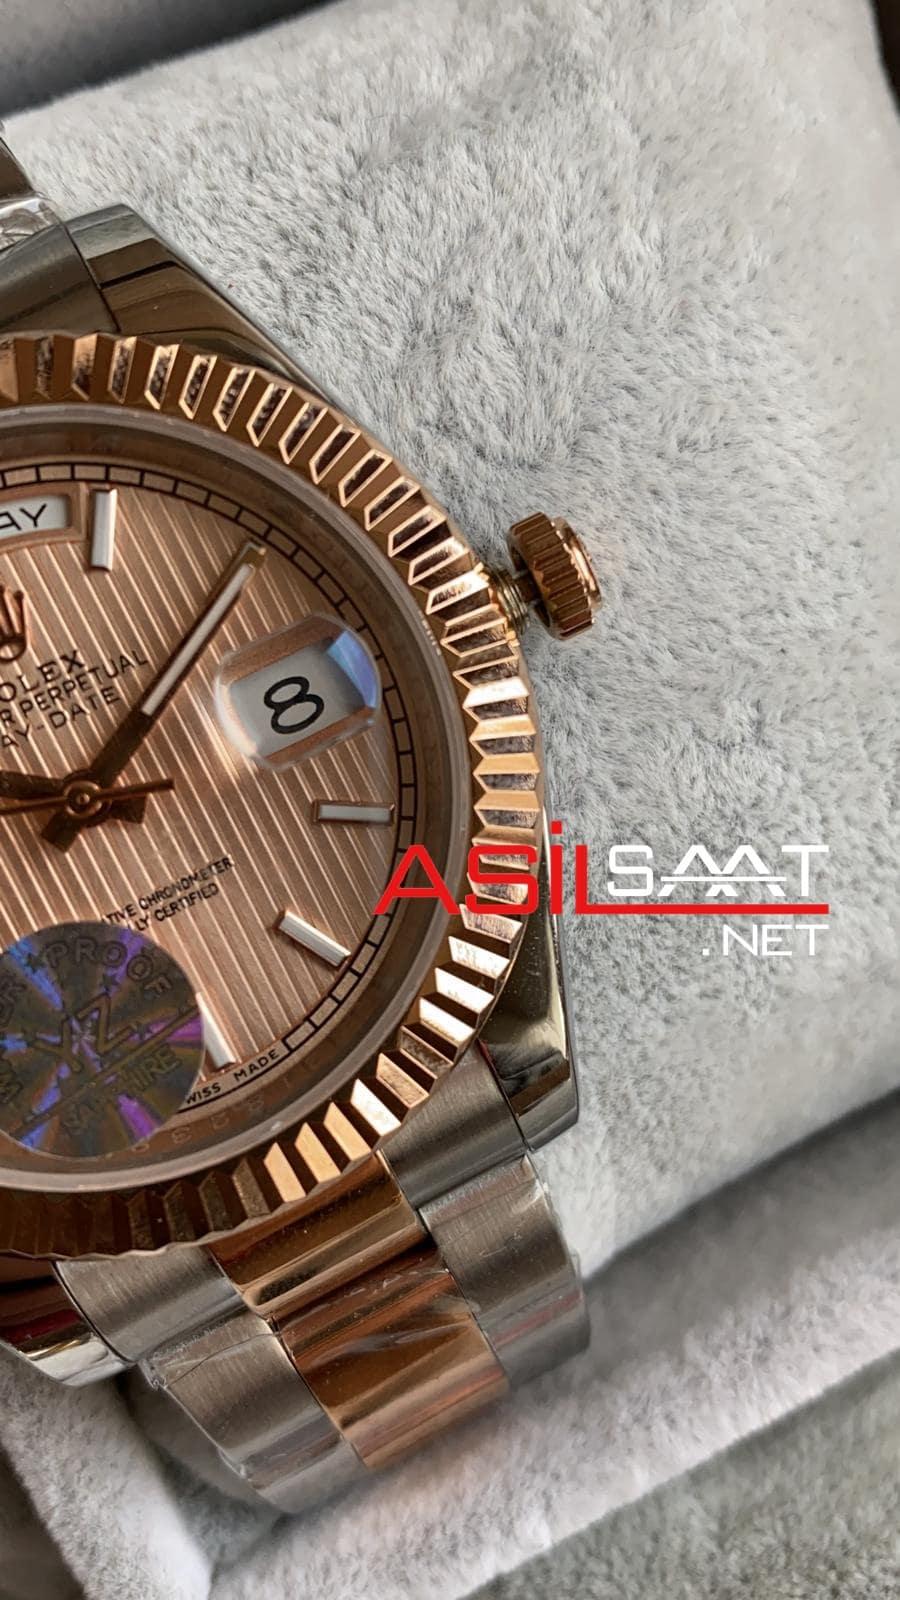 Rolex Day-Date Two Tone Replika Saat ROLDD067